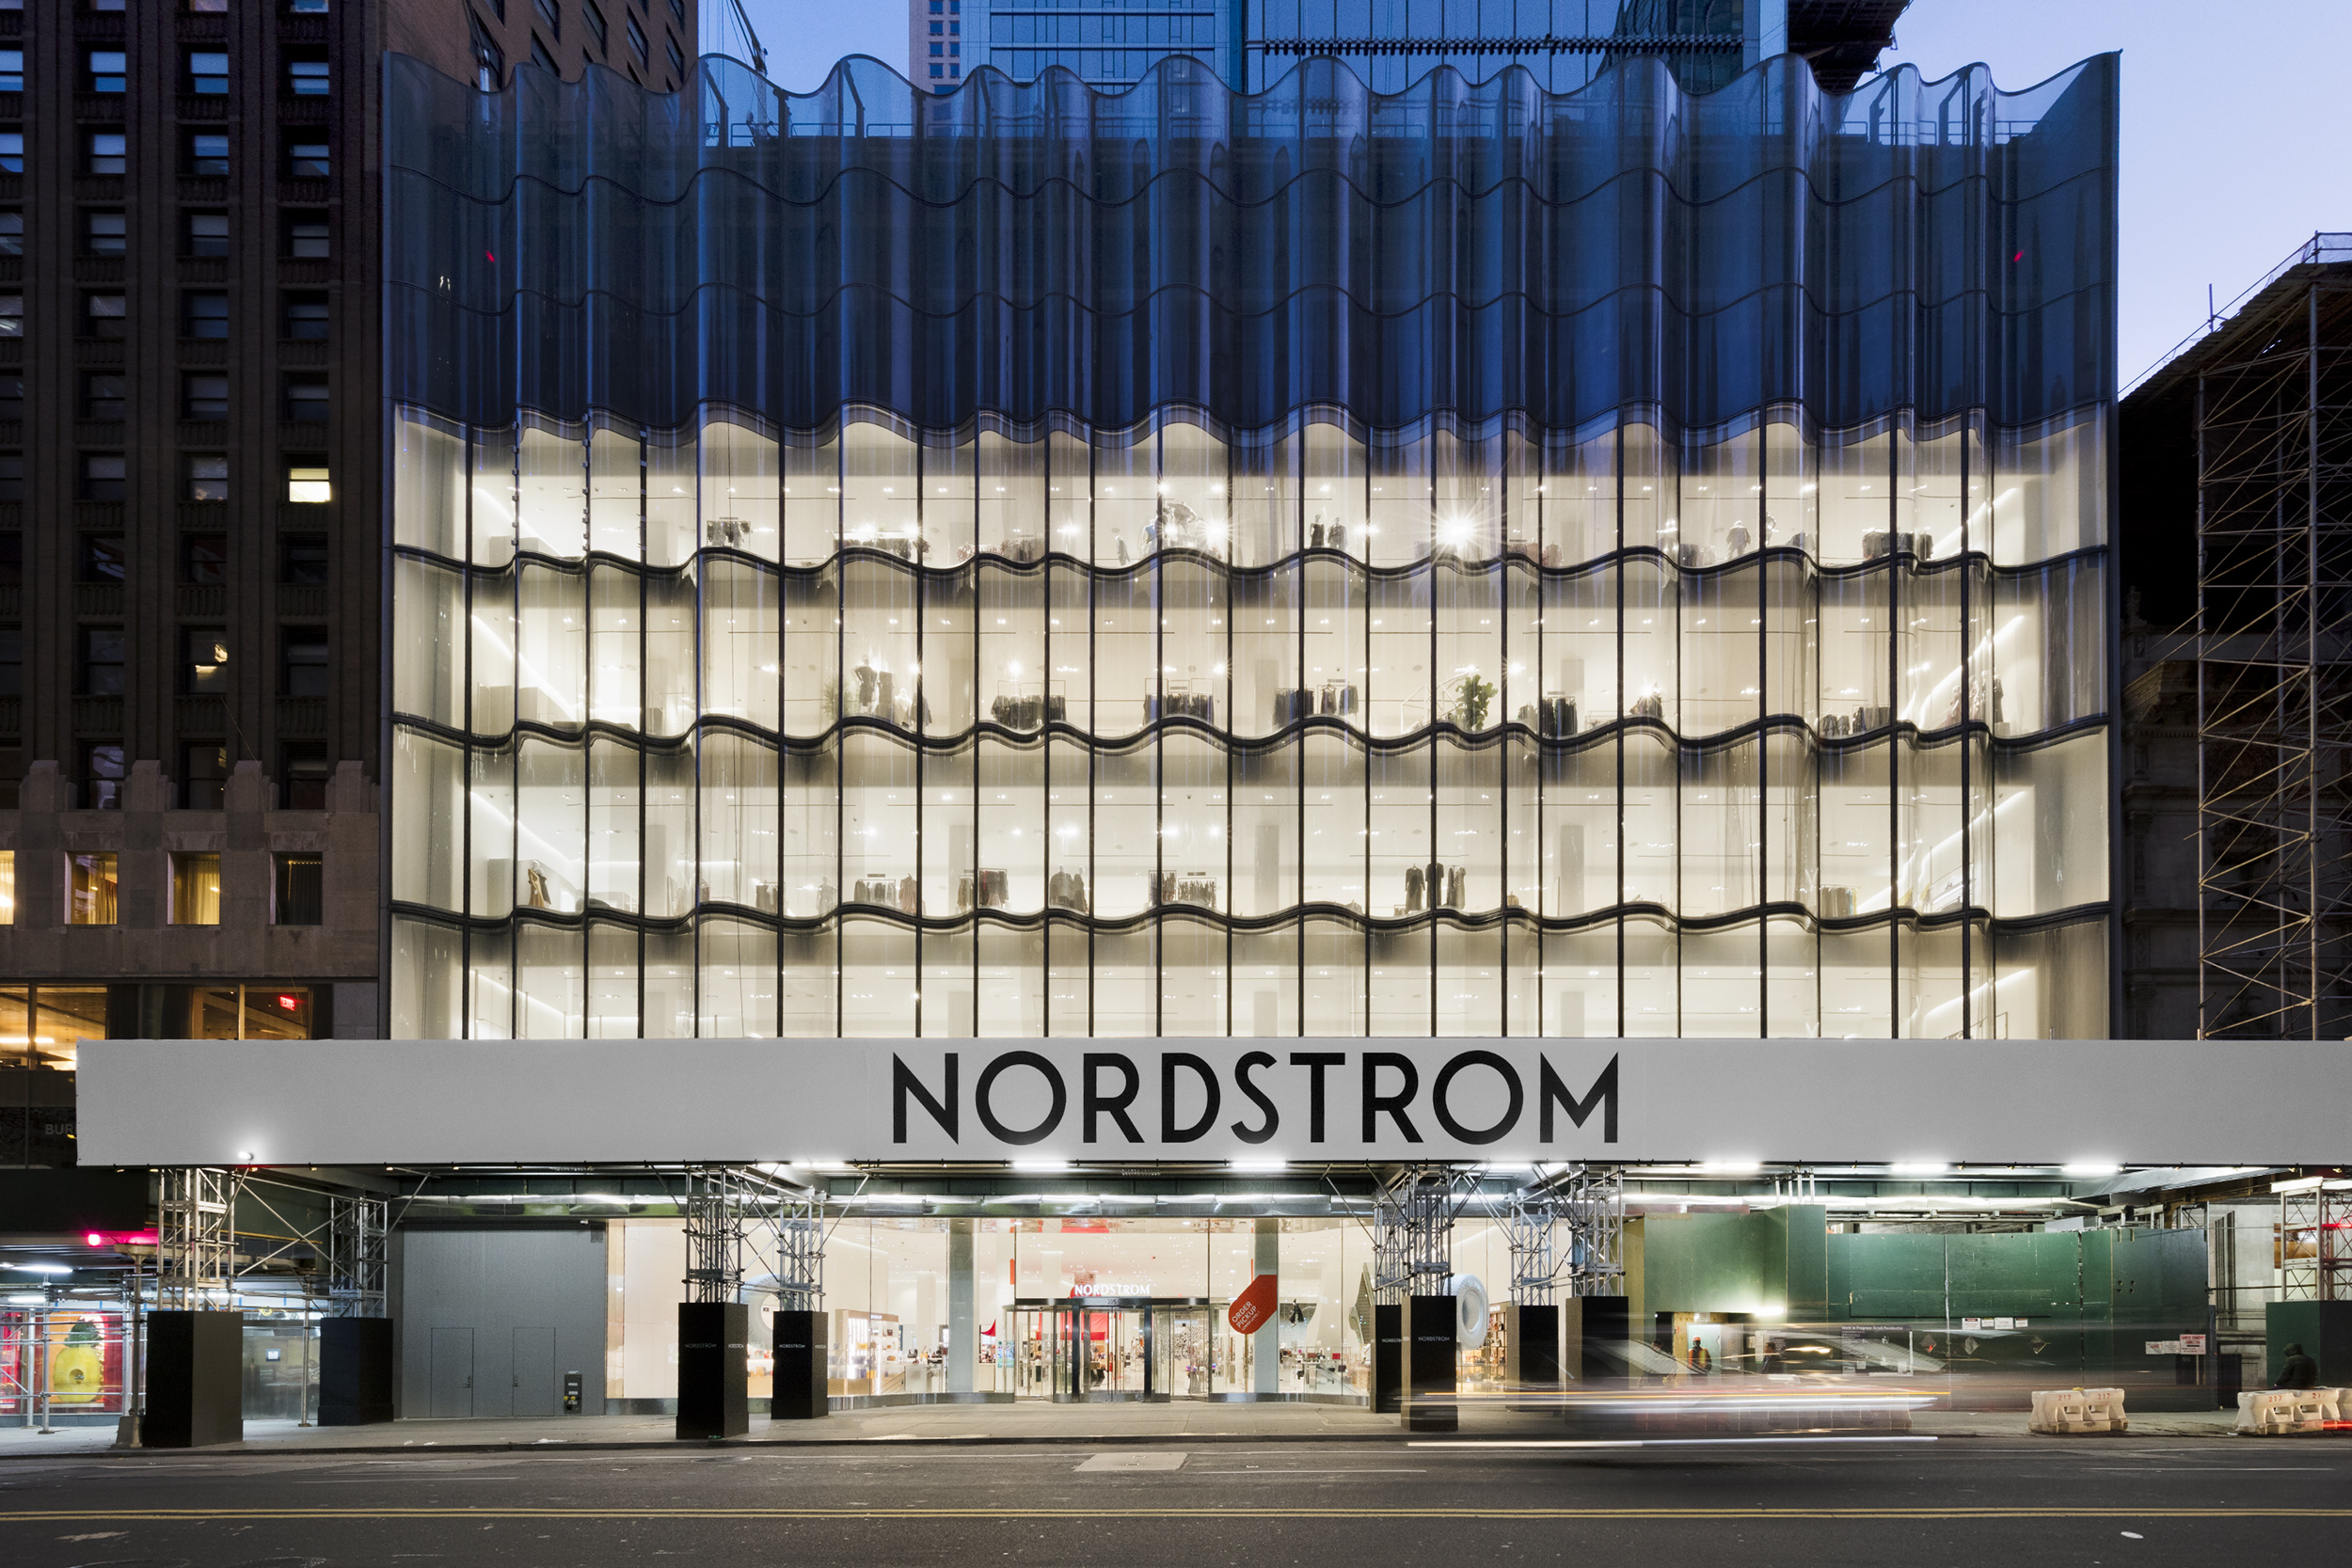 Nordstrom New York city